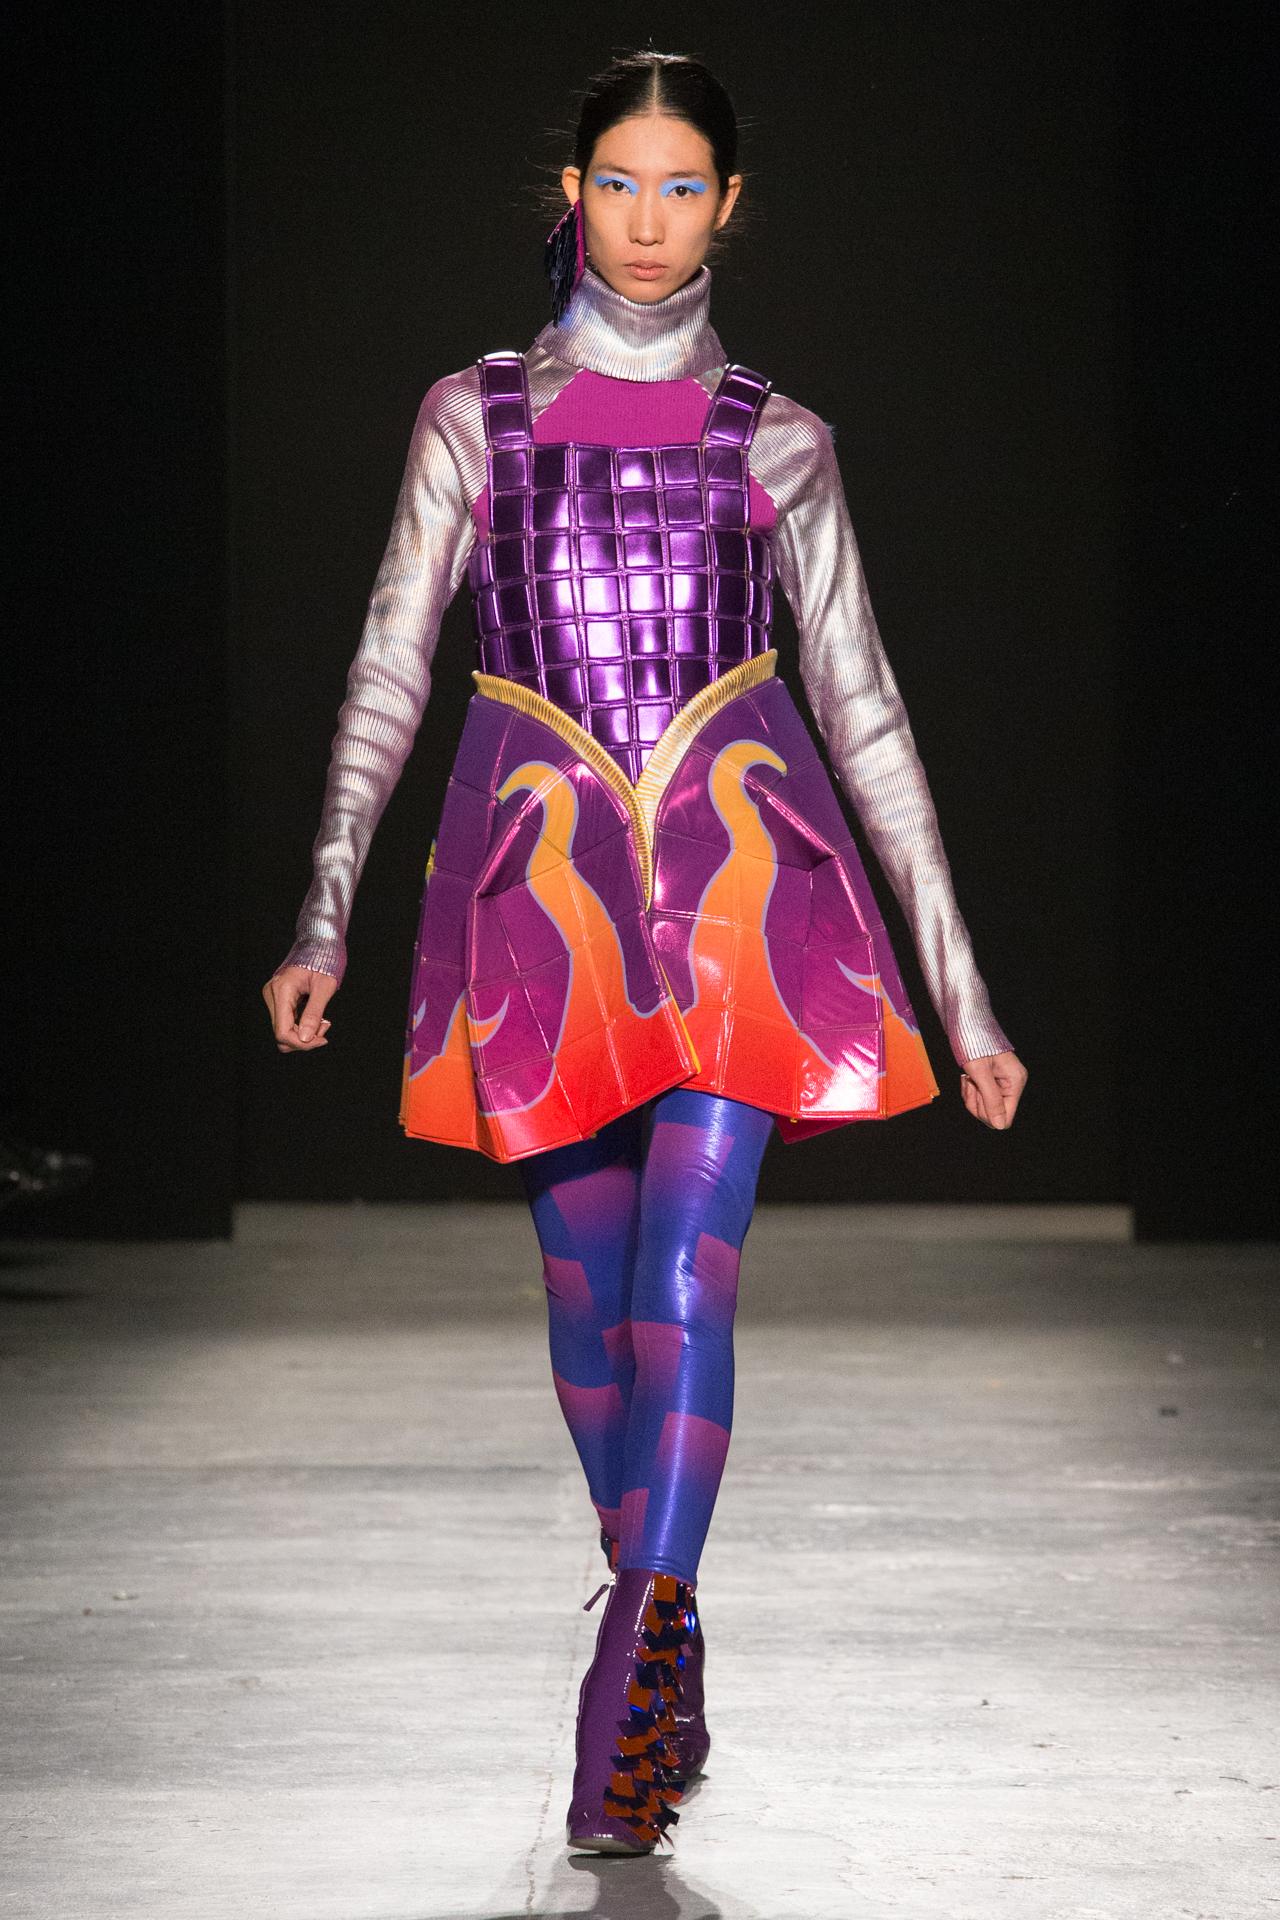 Westminster_Fashion_72dpi_AW18_056.jpg